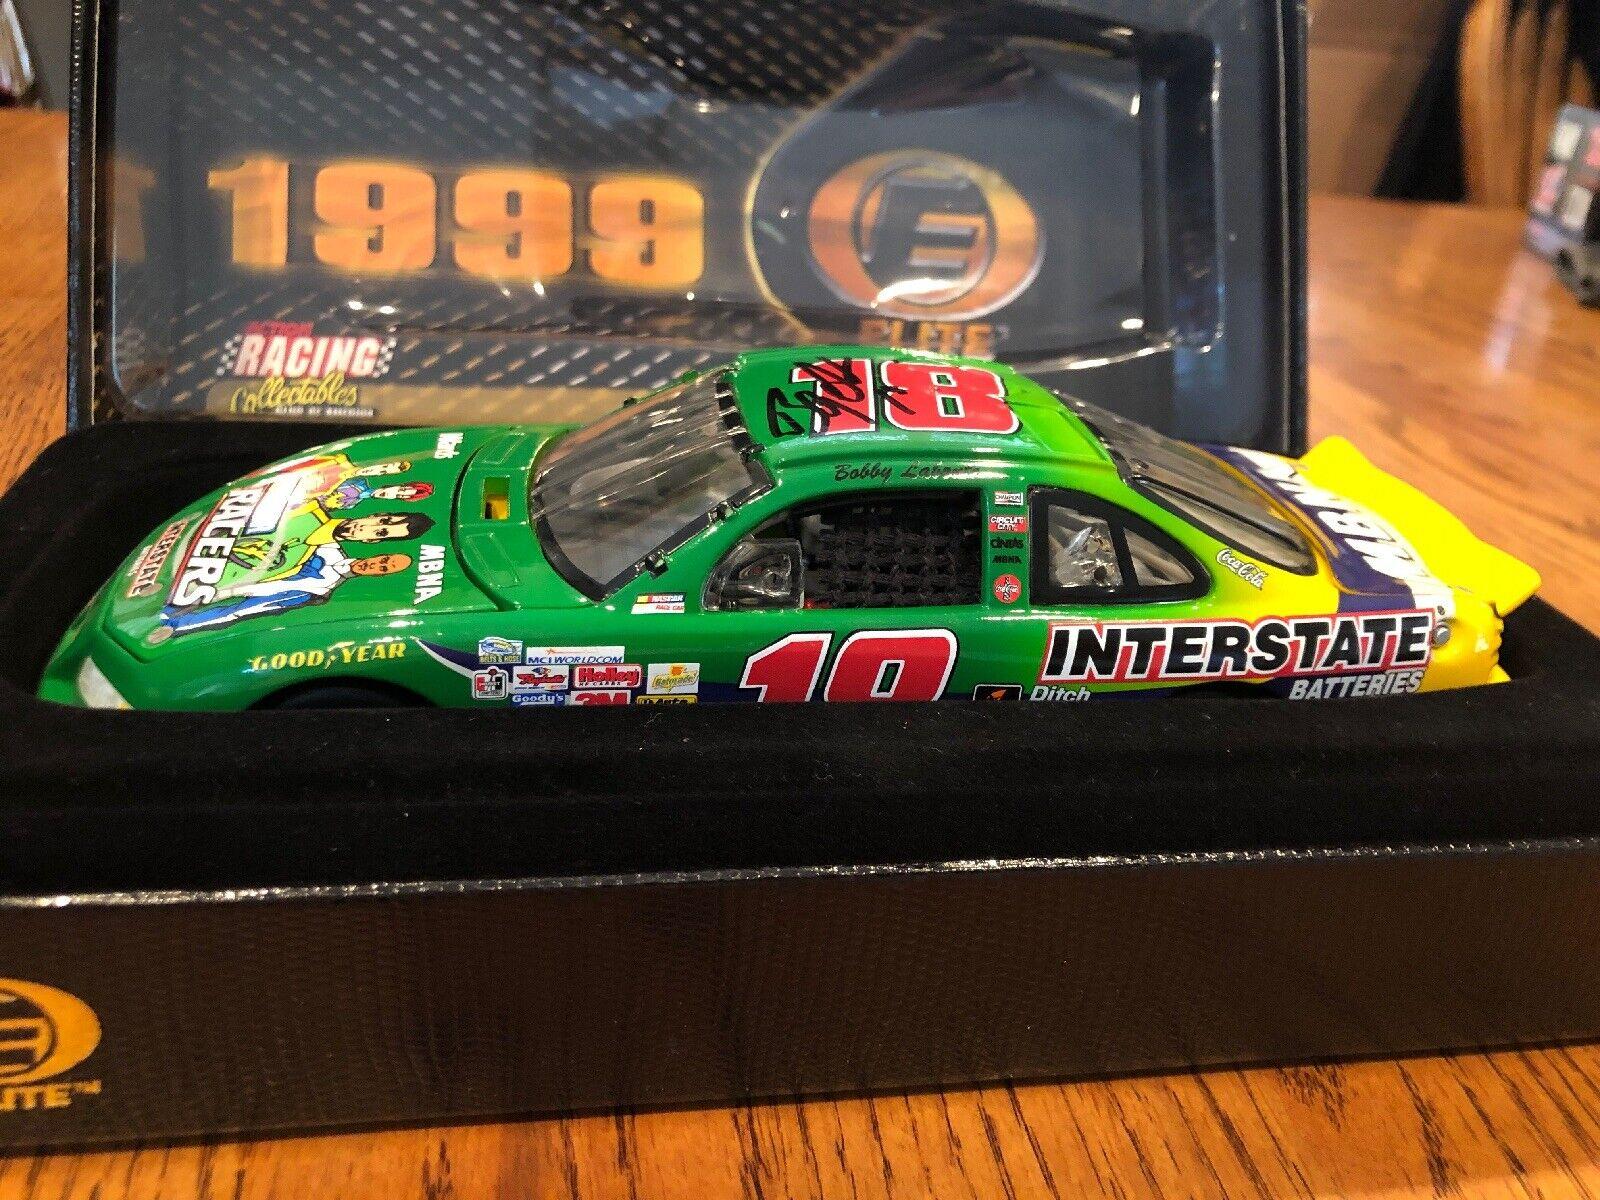 1999 Bobby Labonte AUTOGRAFATO  18 Interstate Batteries NASauto Racing Collectables CLUB OF AMERICA 1 24 Elite